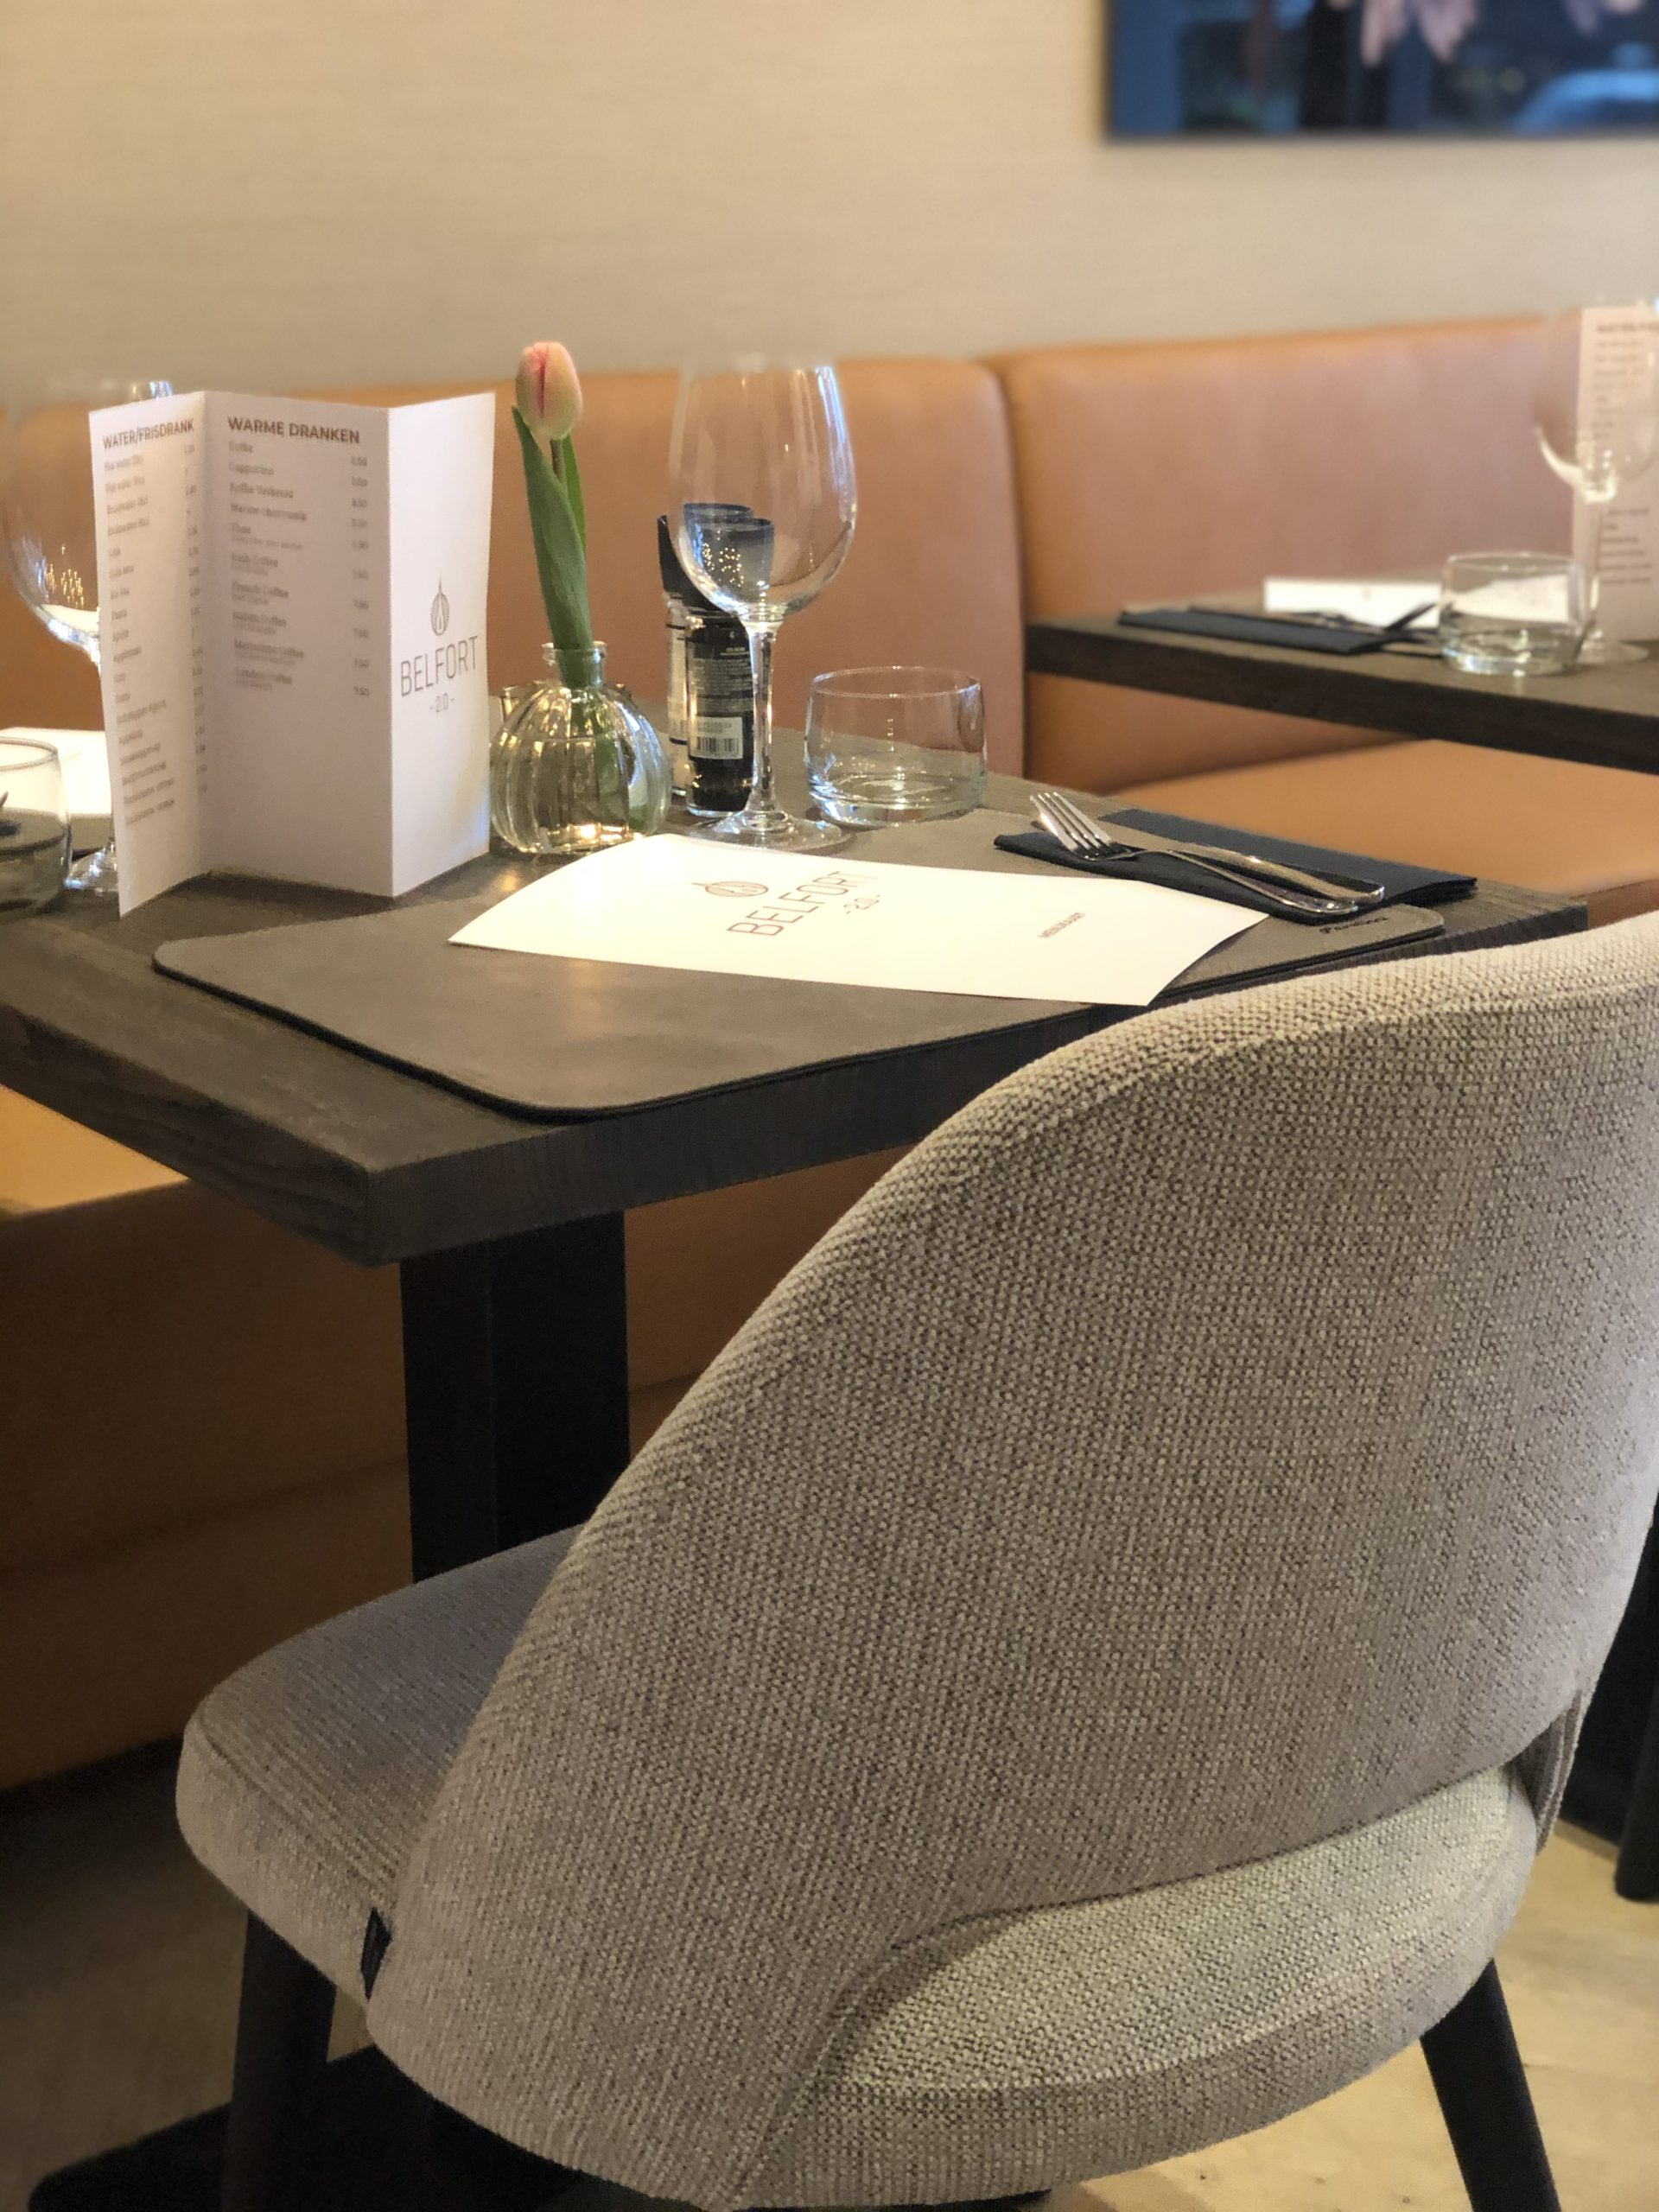 Brasserie Belfort 2.0